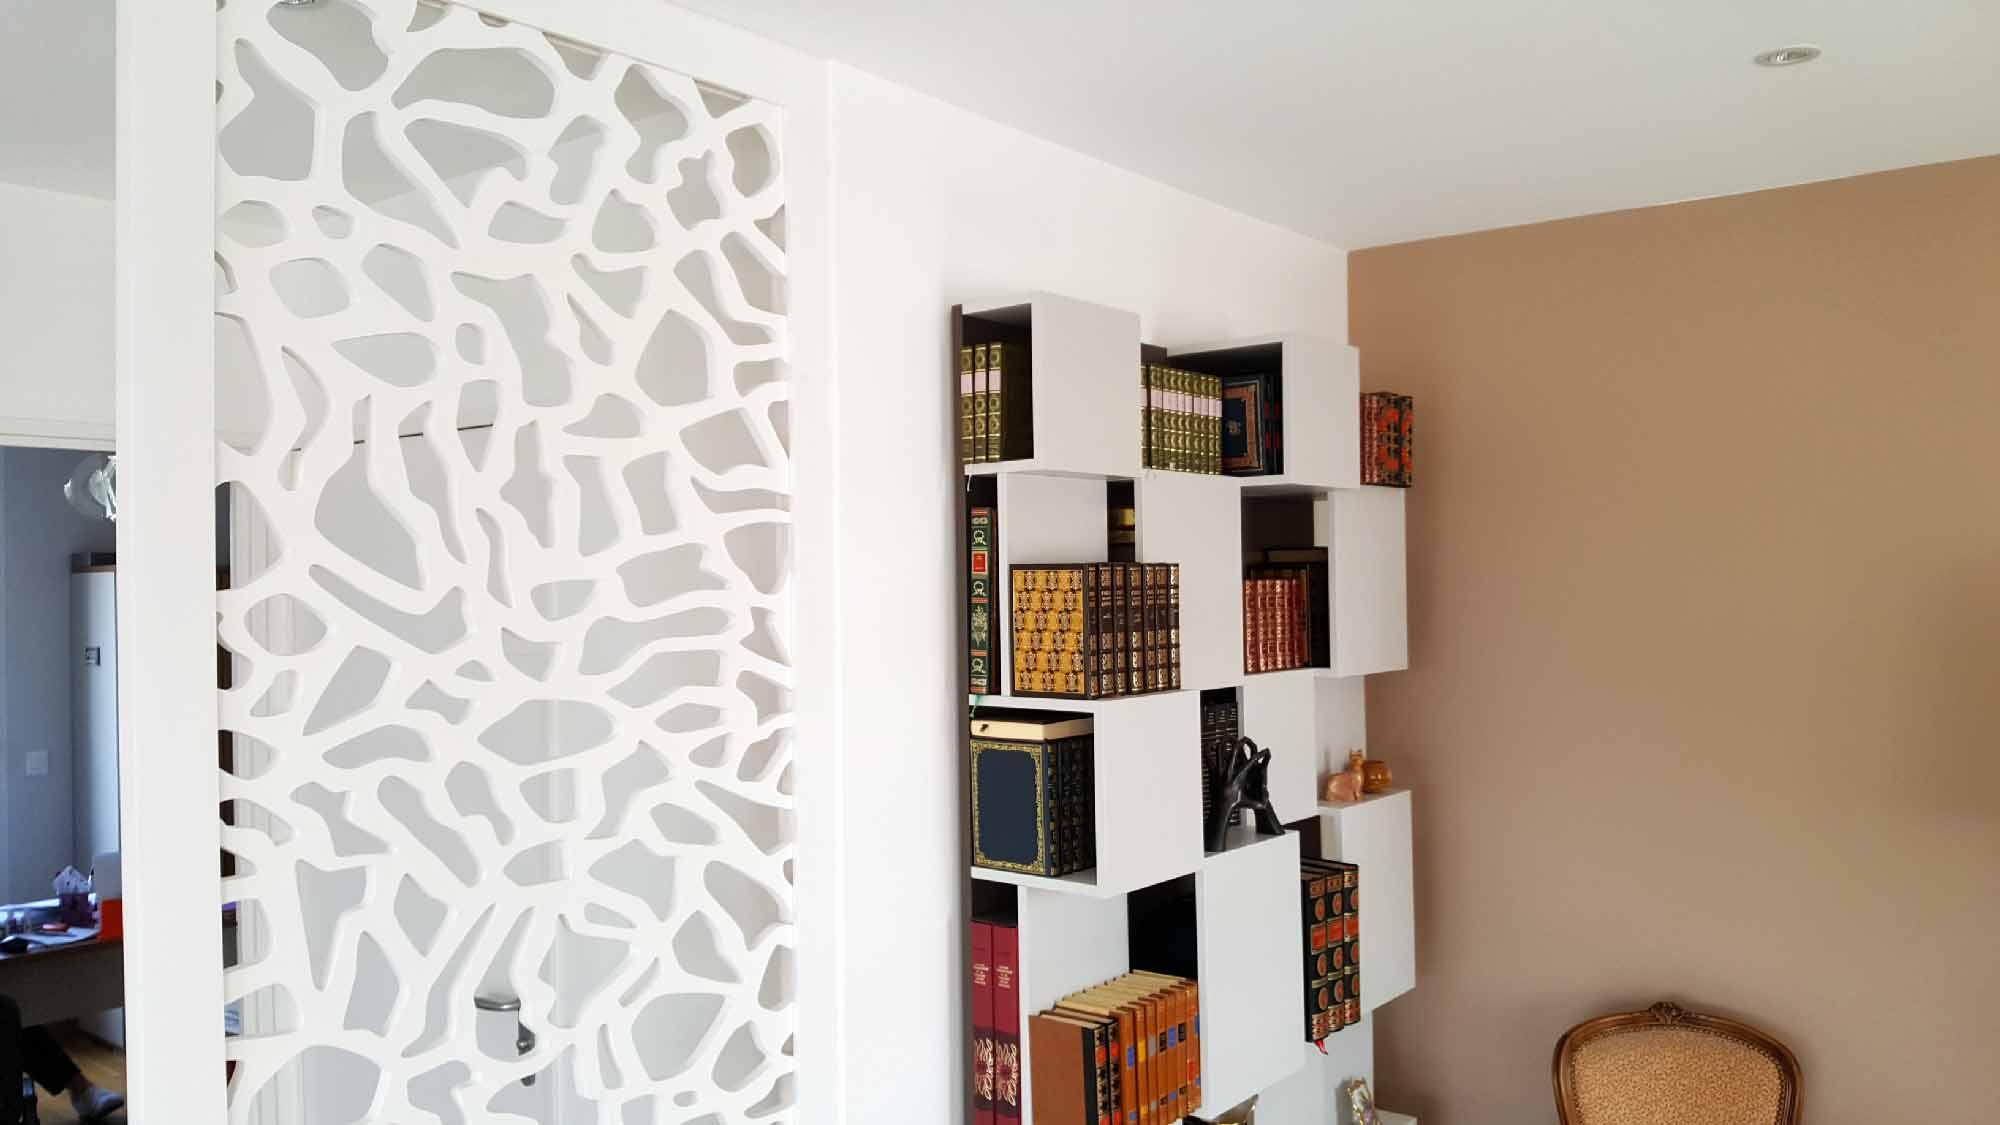 claustra bois mucida. Black Bedroom Furniture Sets. Home Design Ideas